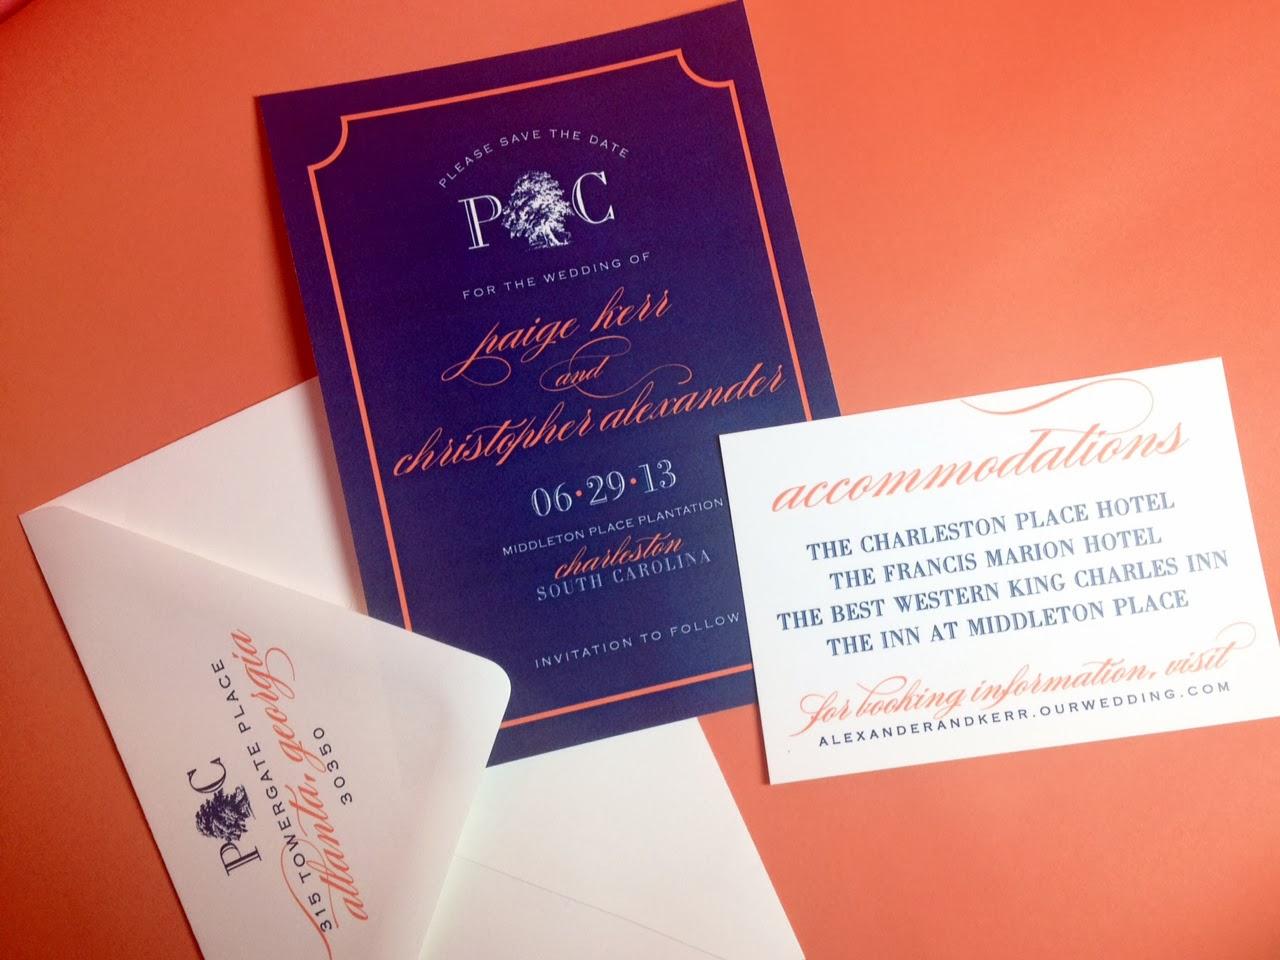 Charleston Wedding save the date